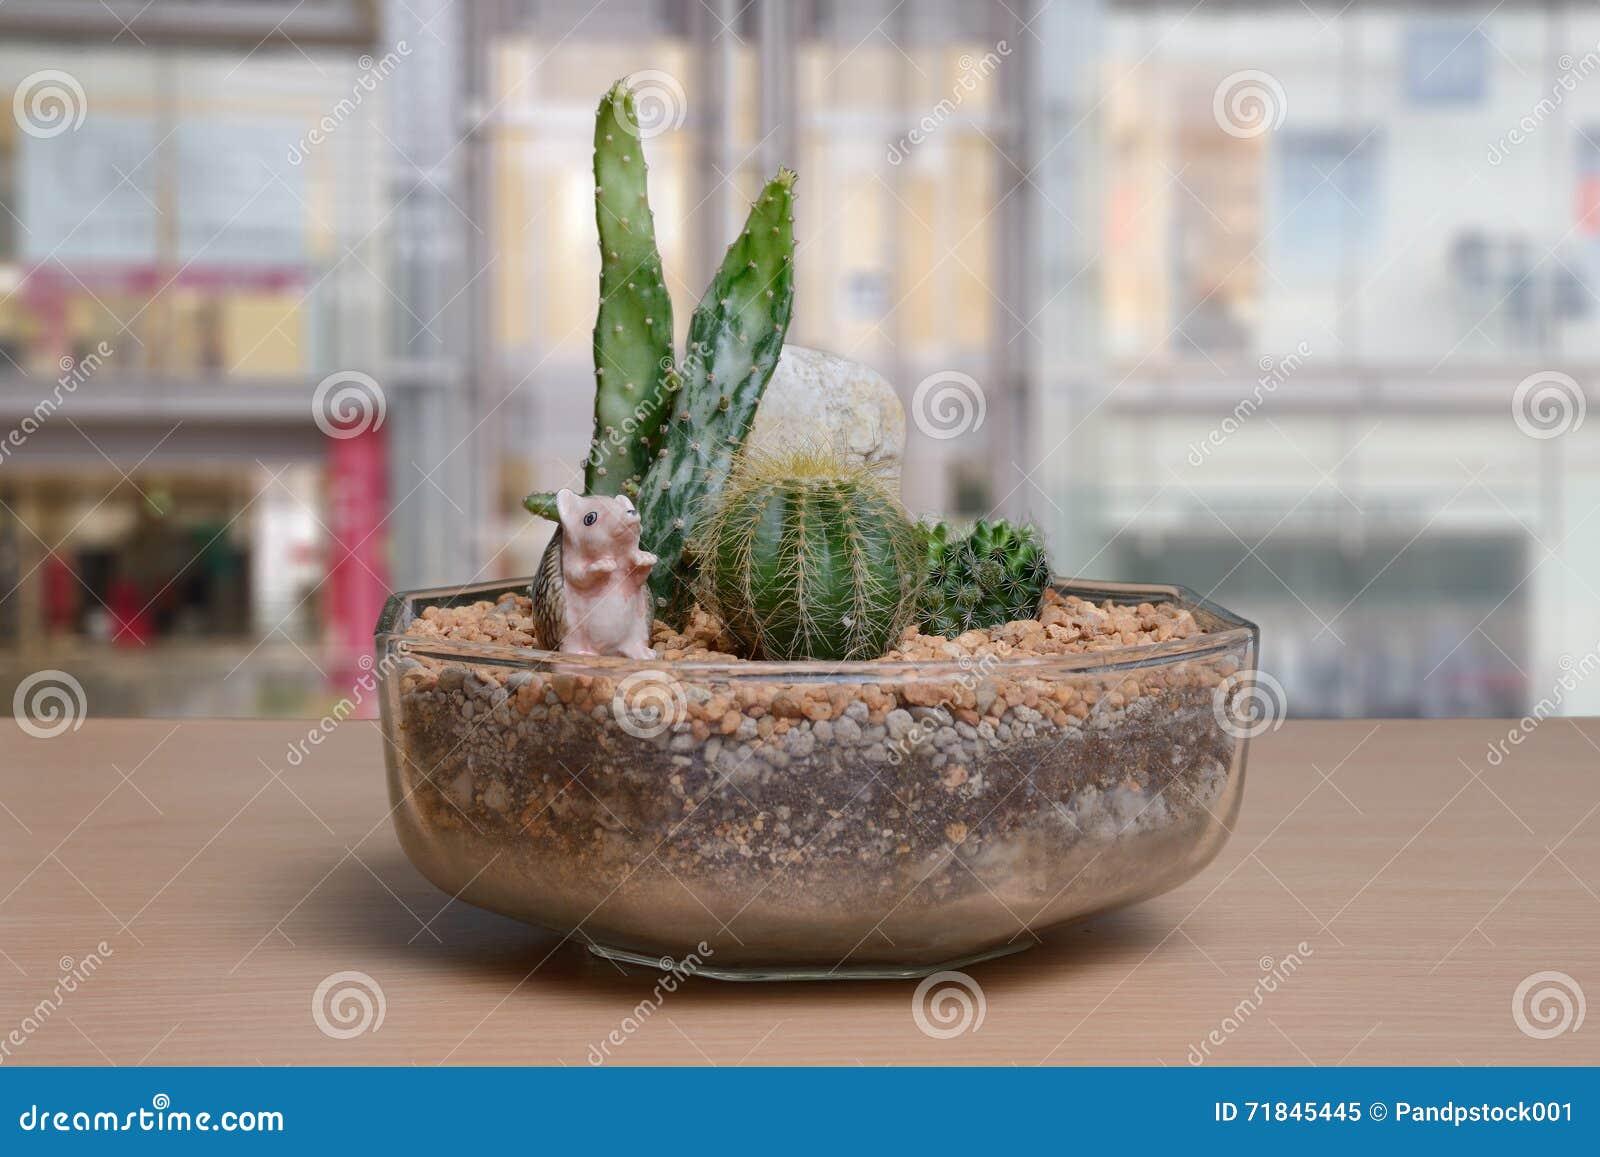 Small Cactus Garden On Table Near Window.